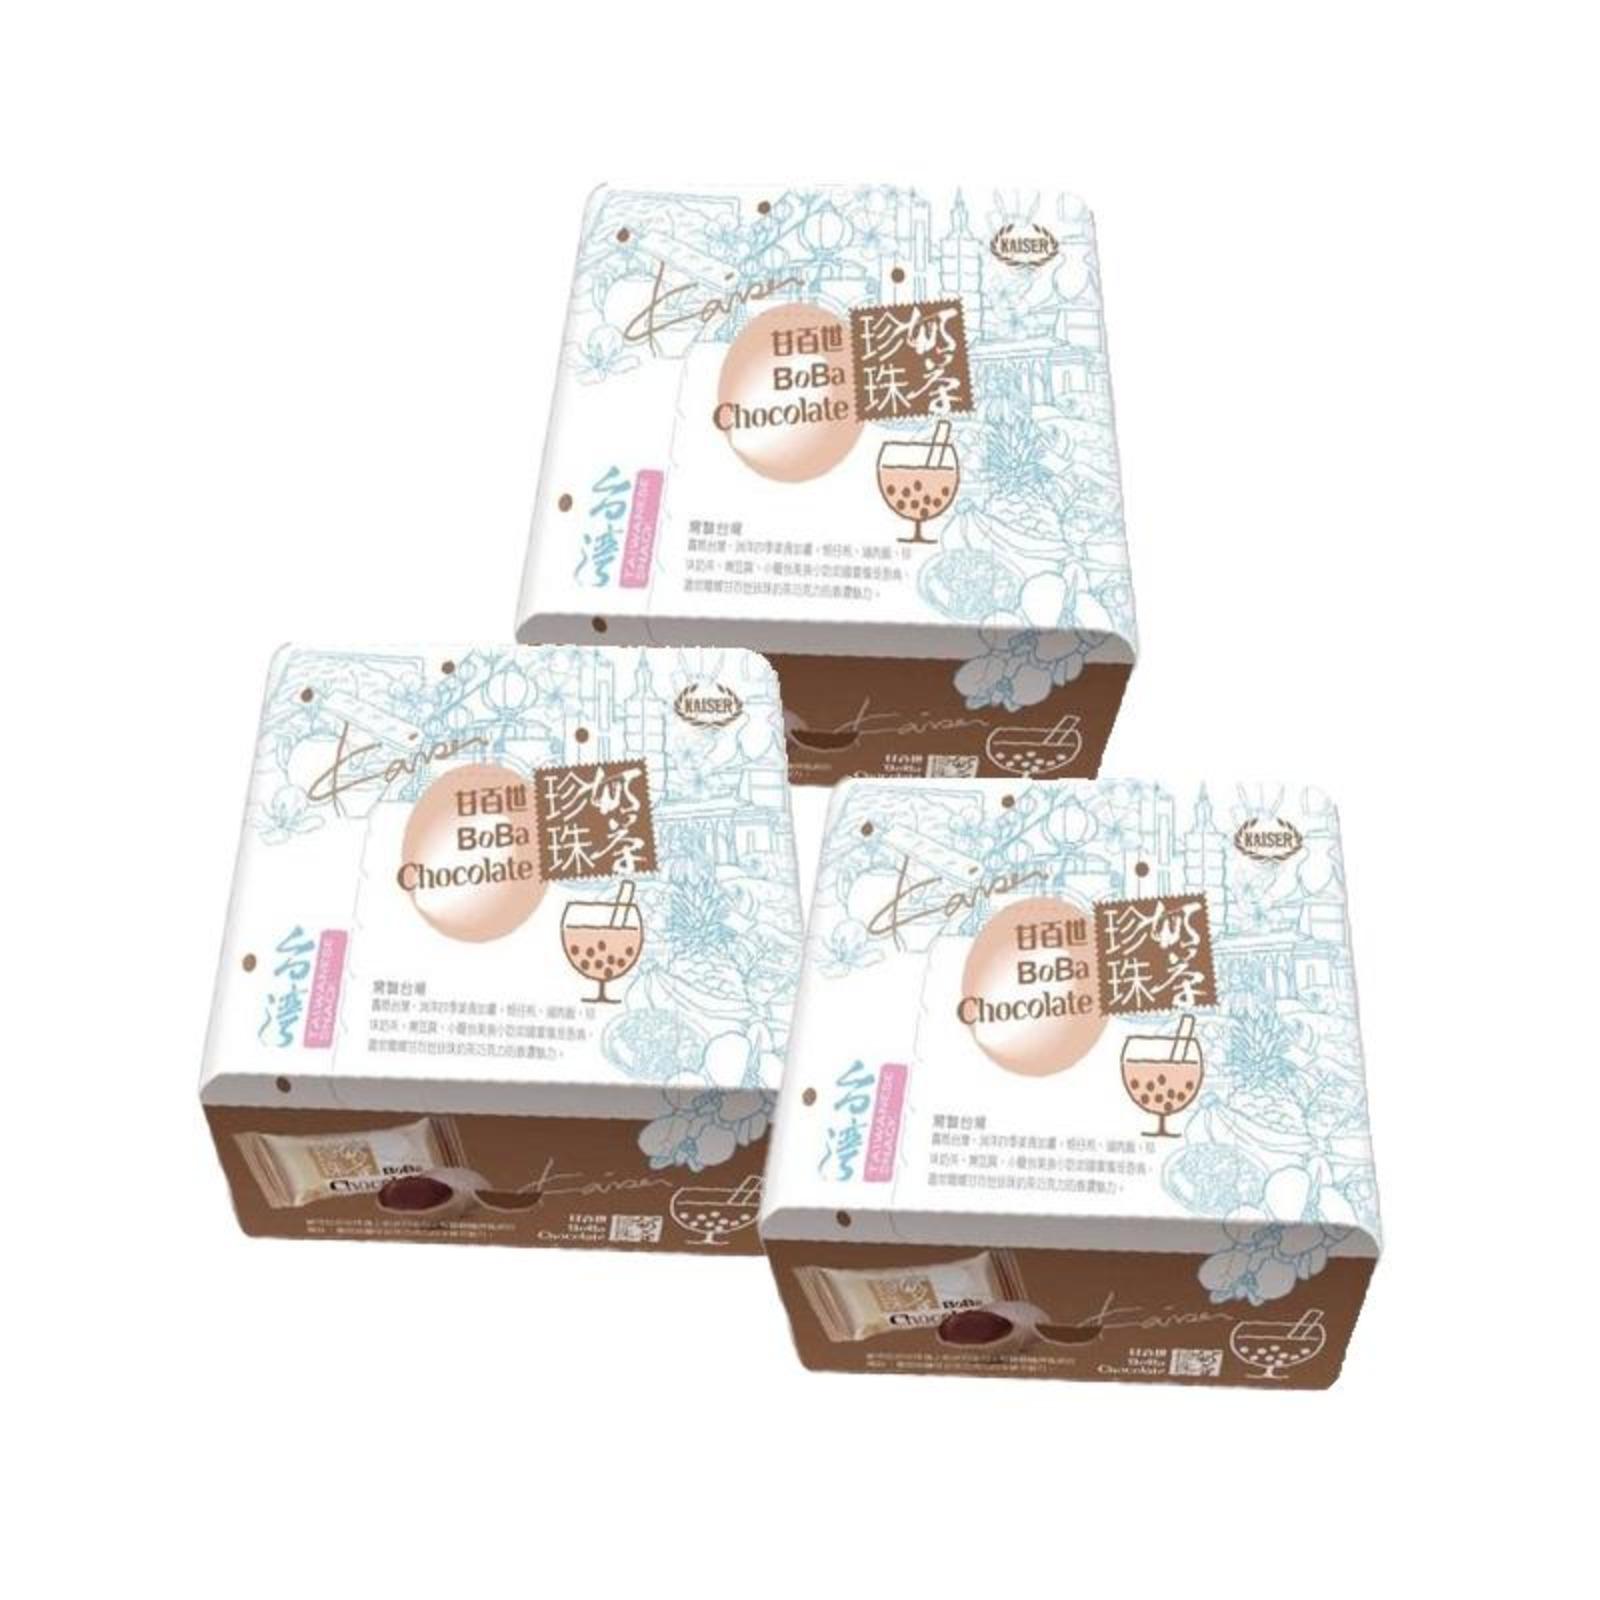 Kaiser  Bo Ba Chocolate 3S 70g